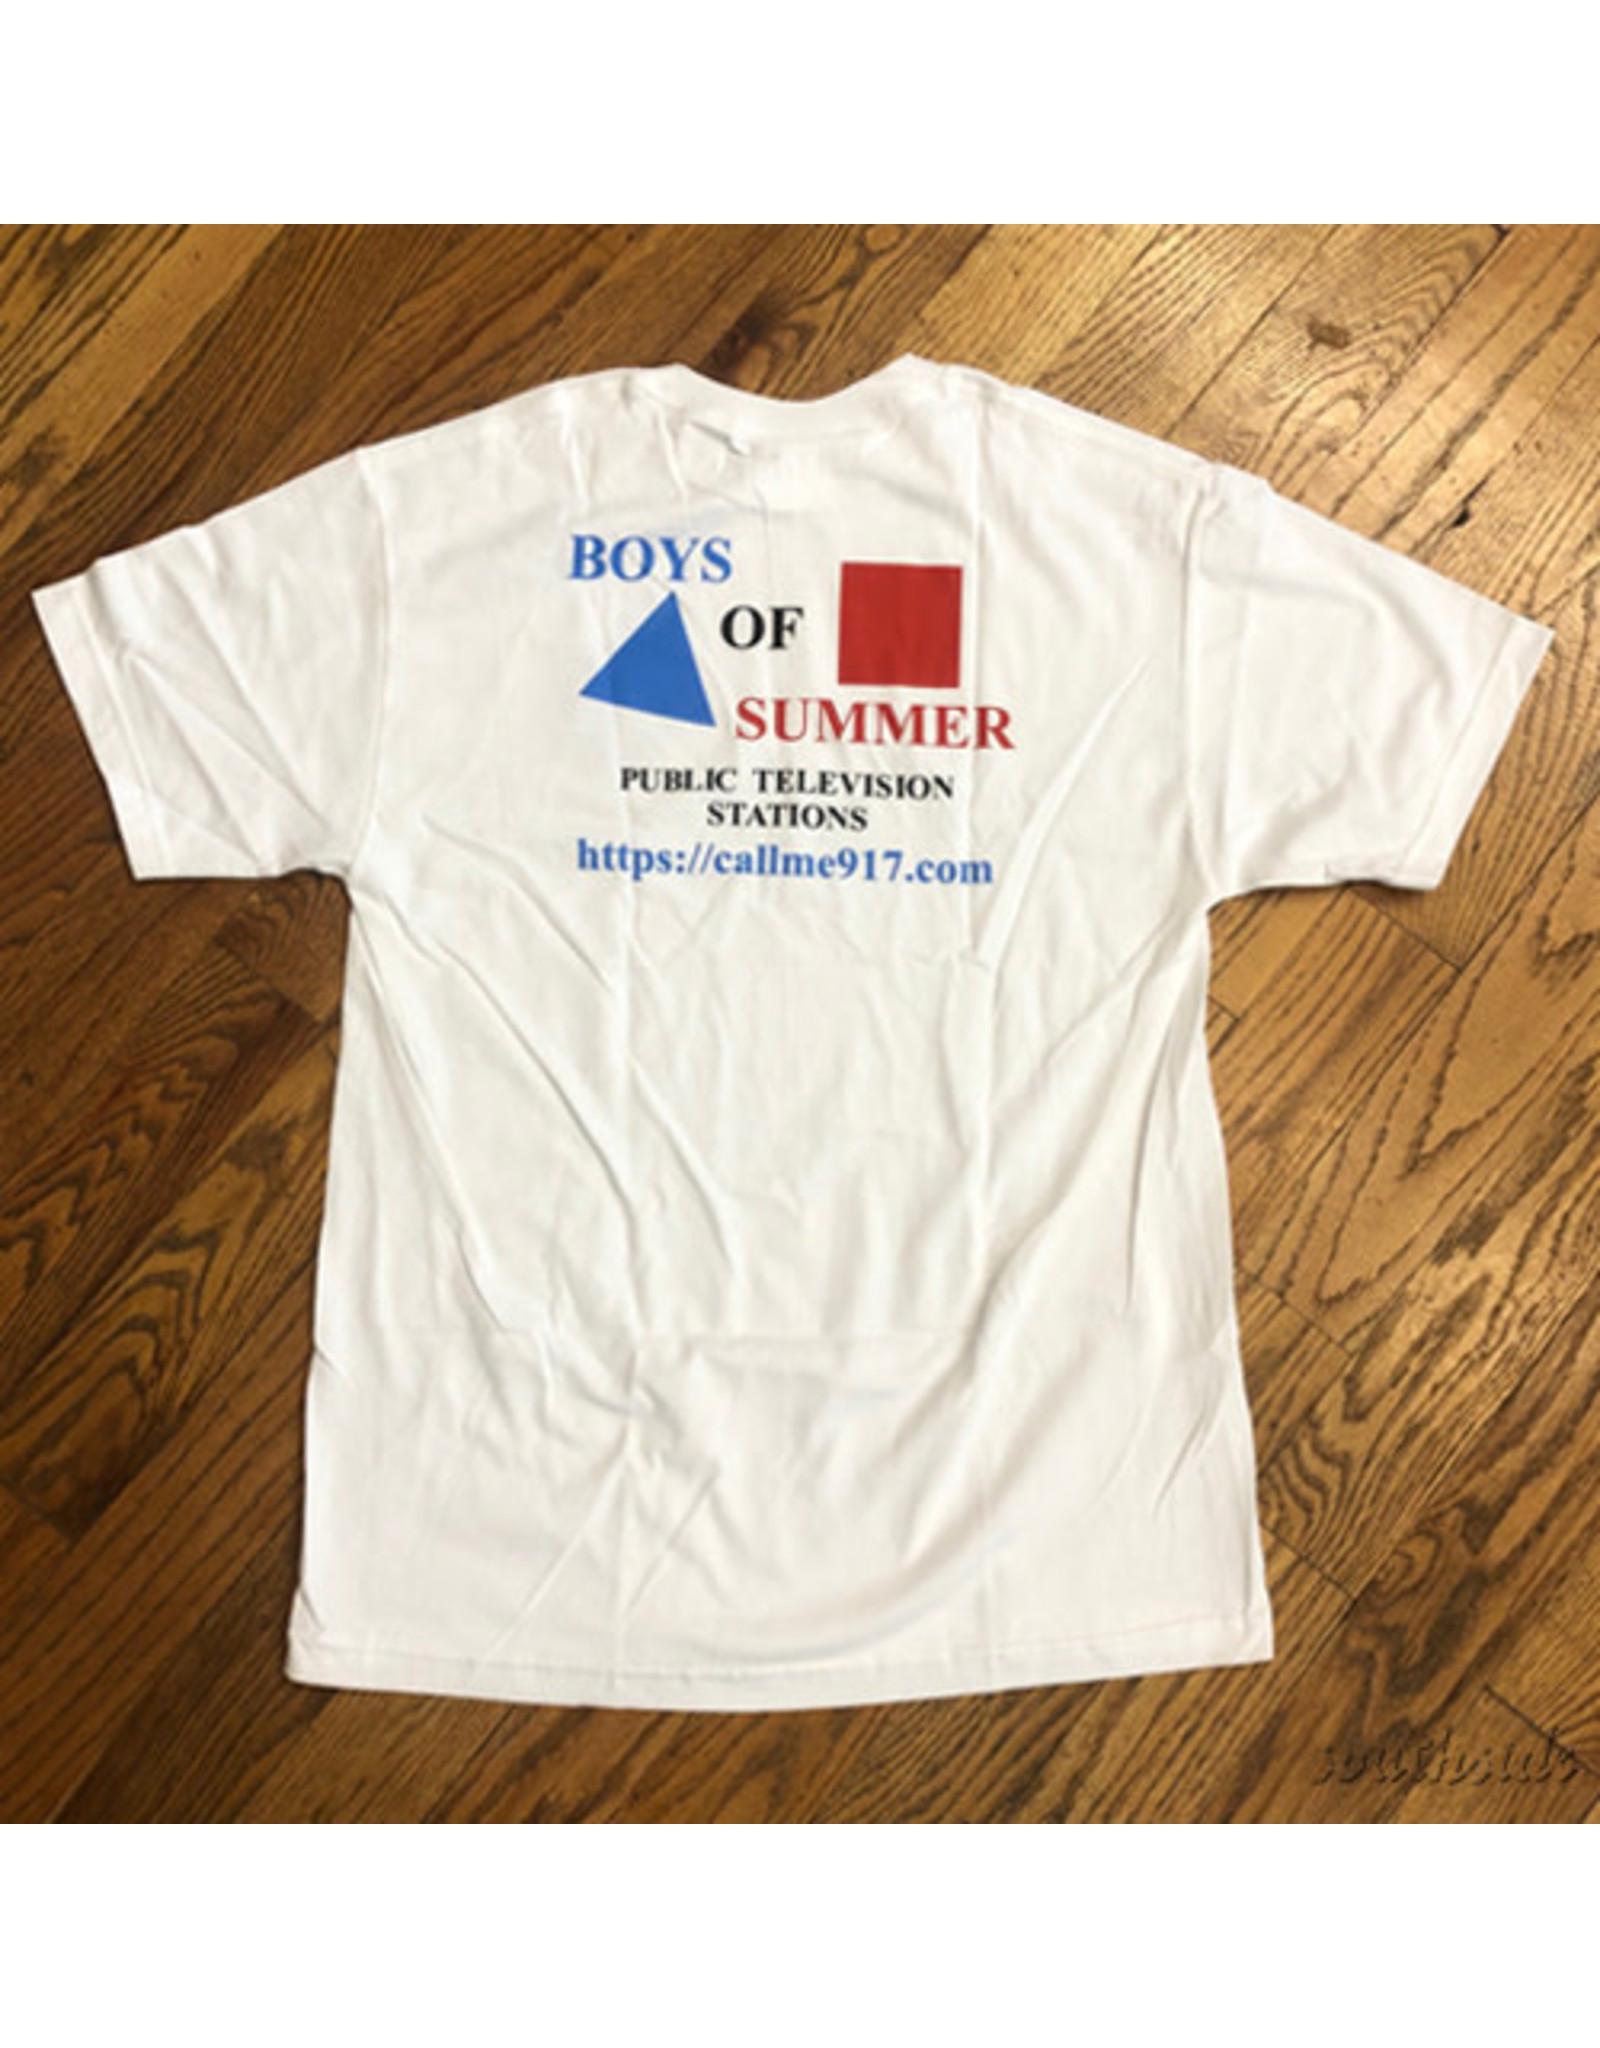 Boys of Summer Boys of Summer Tee CPB White